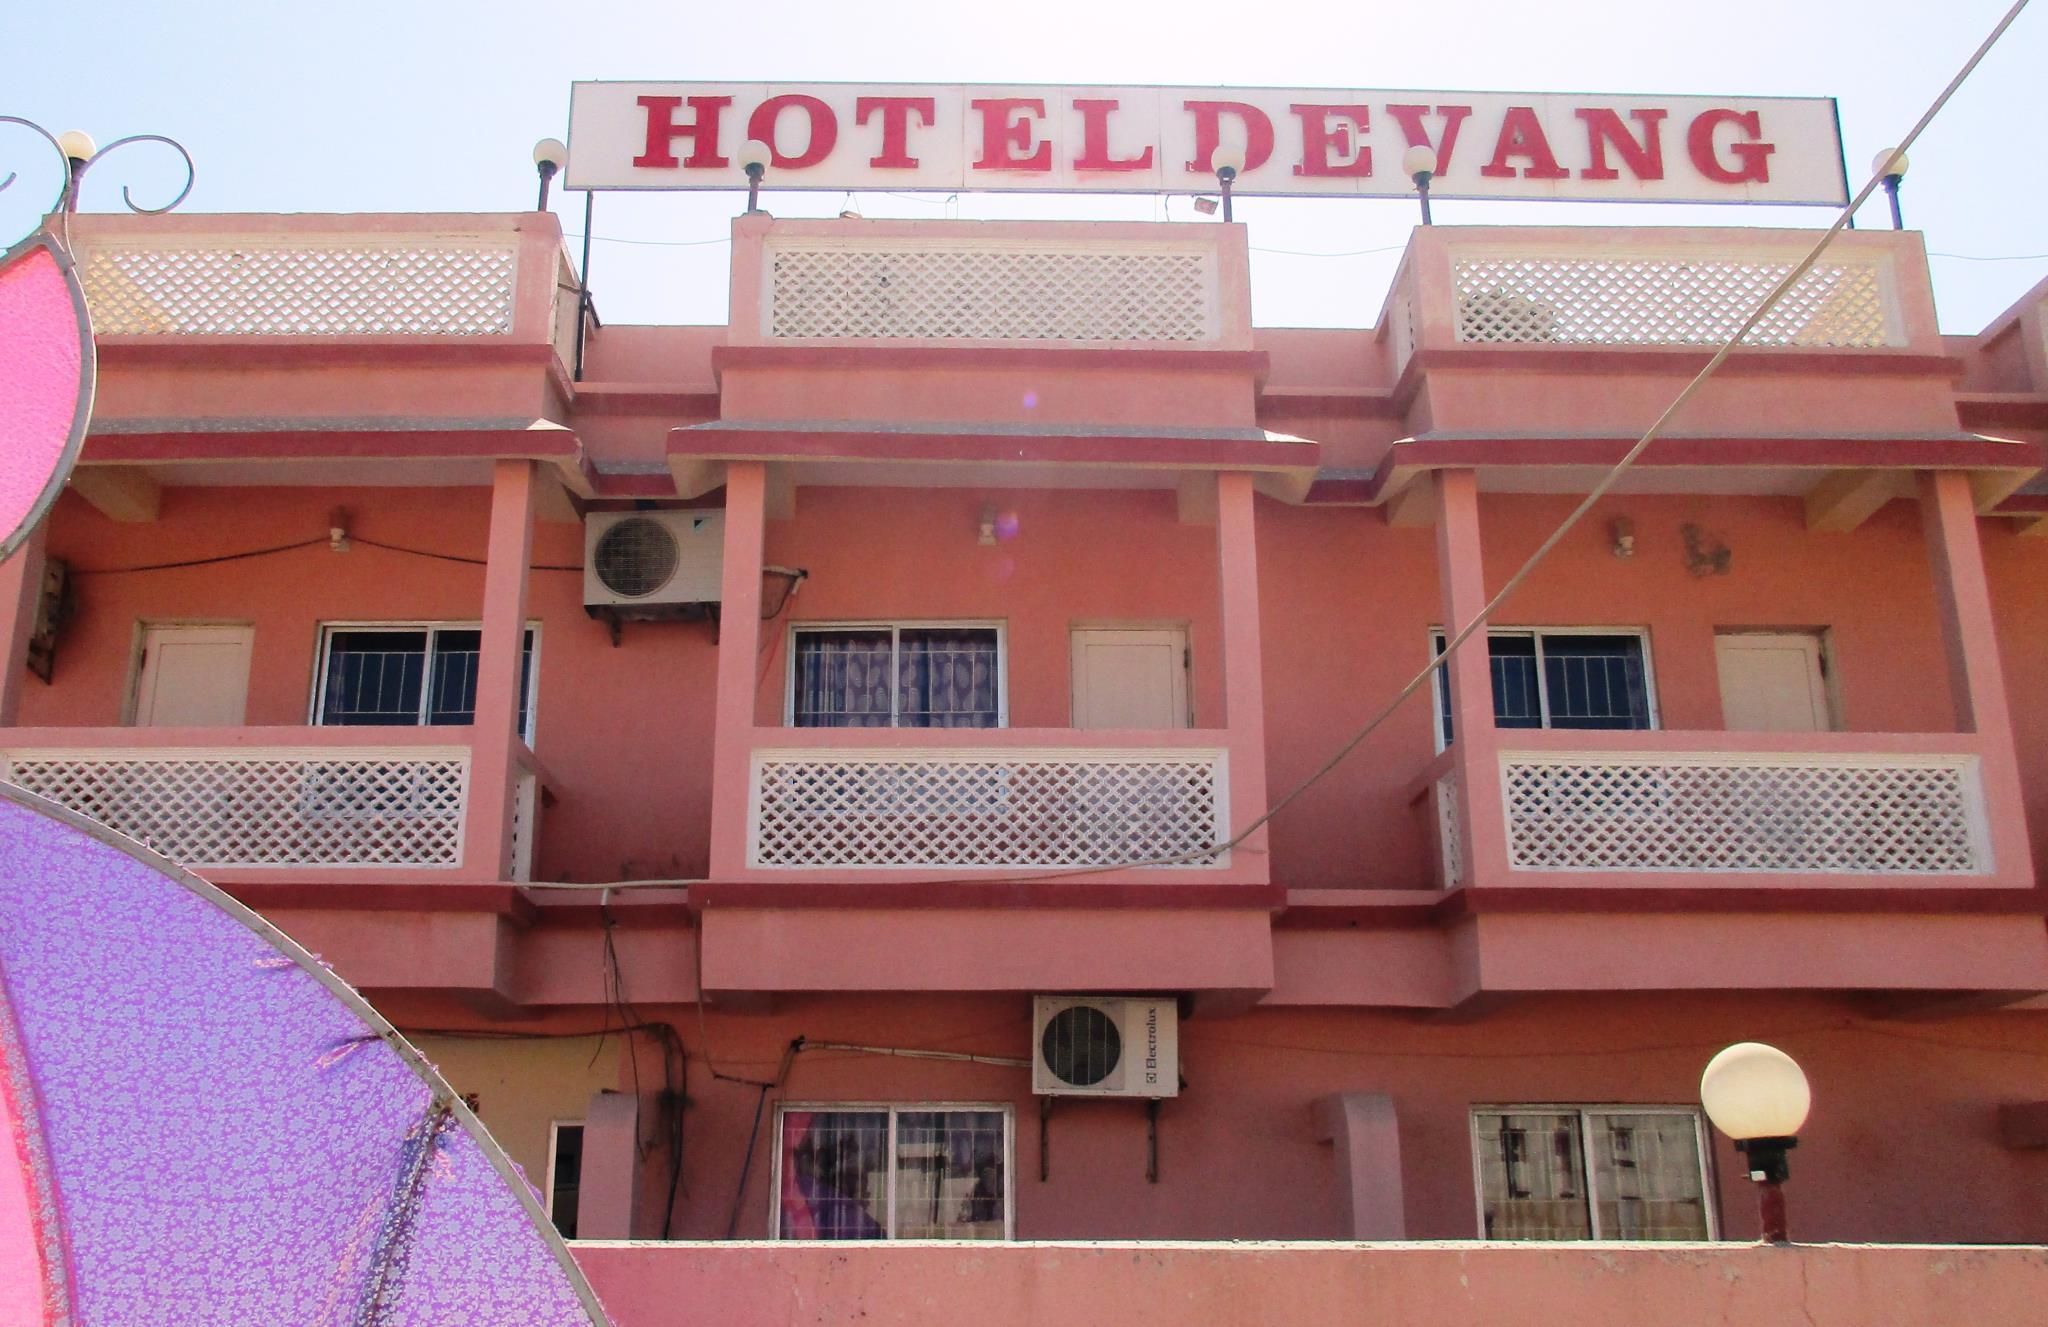 Hotel Devang, Devbhumi Dwarka